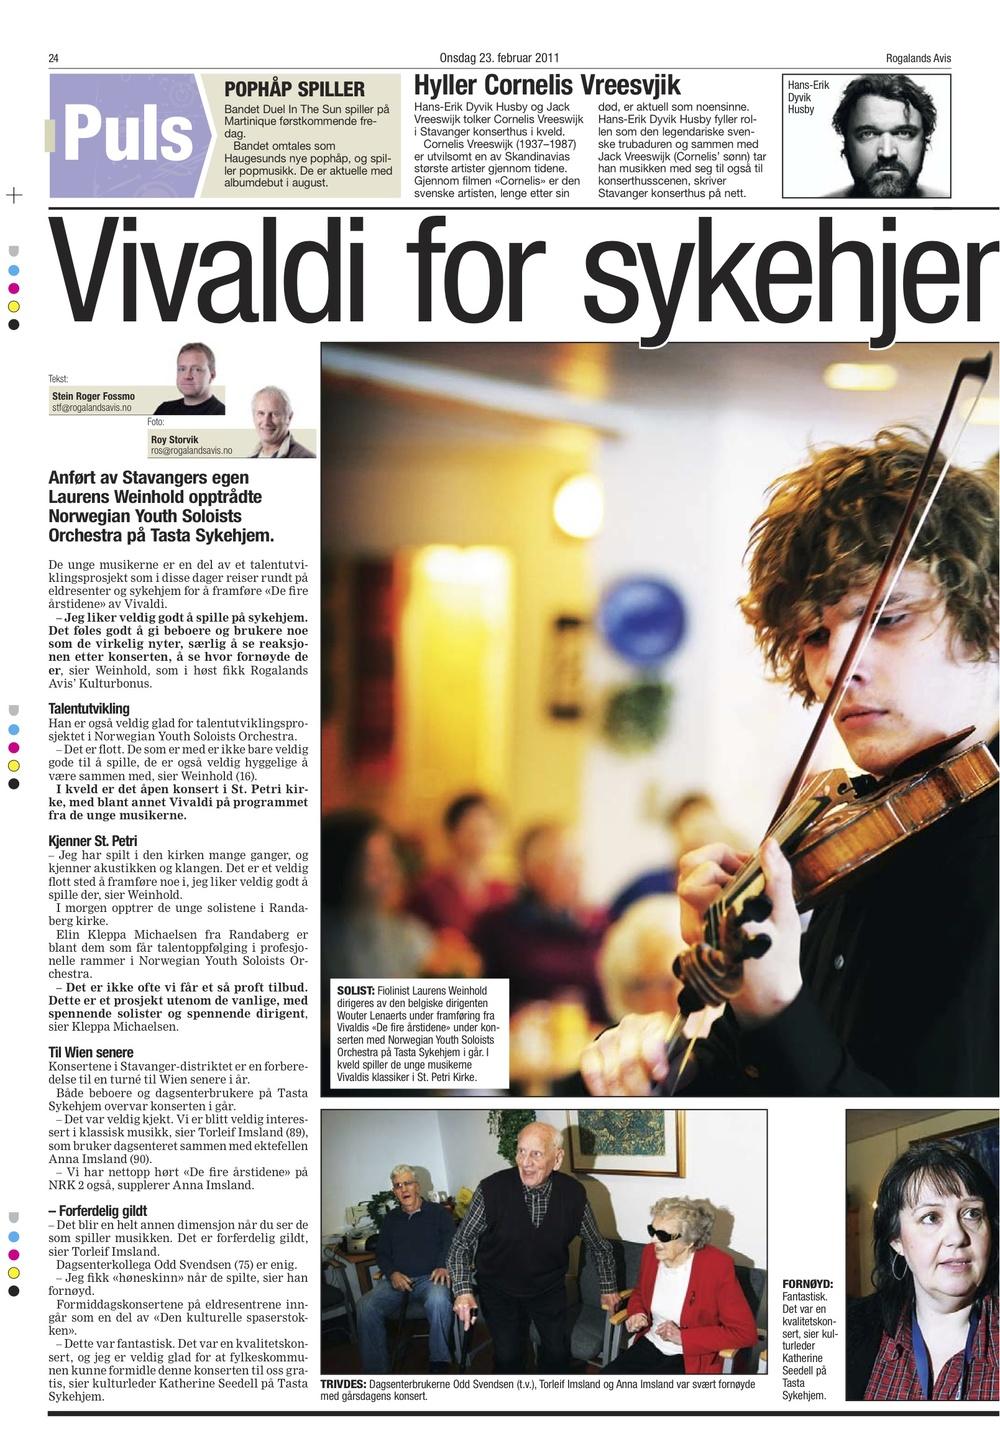 Rogalands Avis, February 23rd 2011